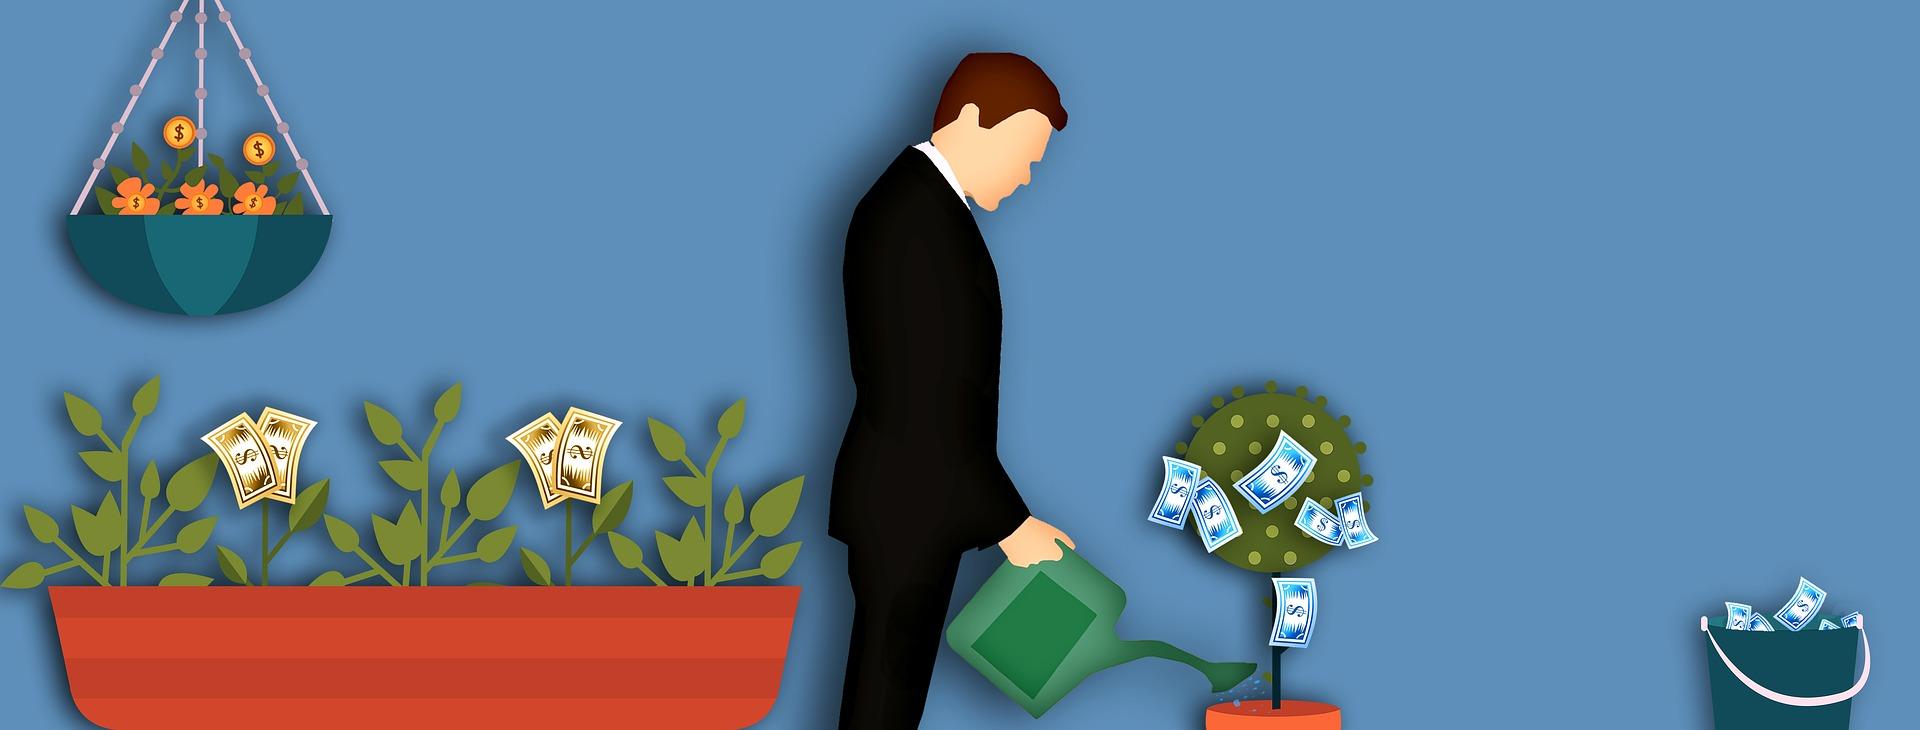 Valto_Business growth